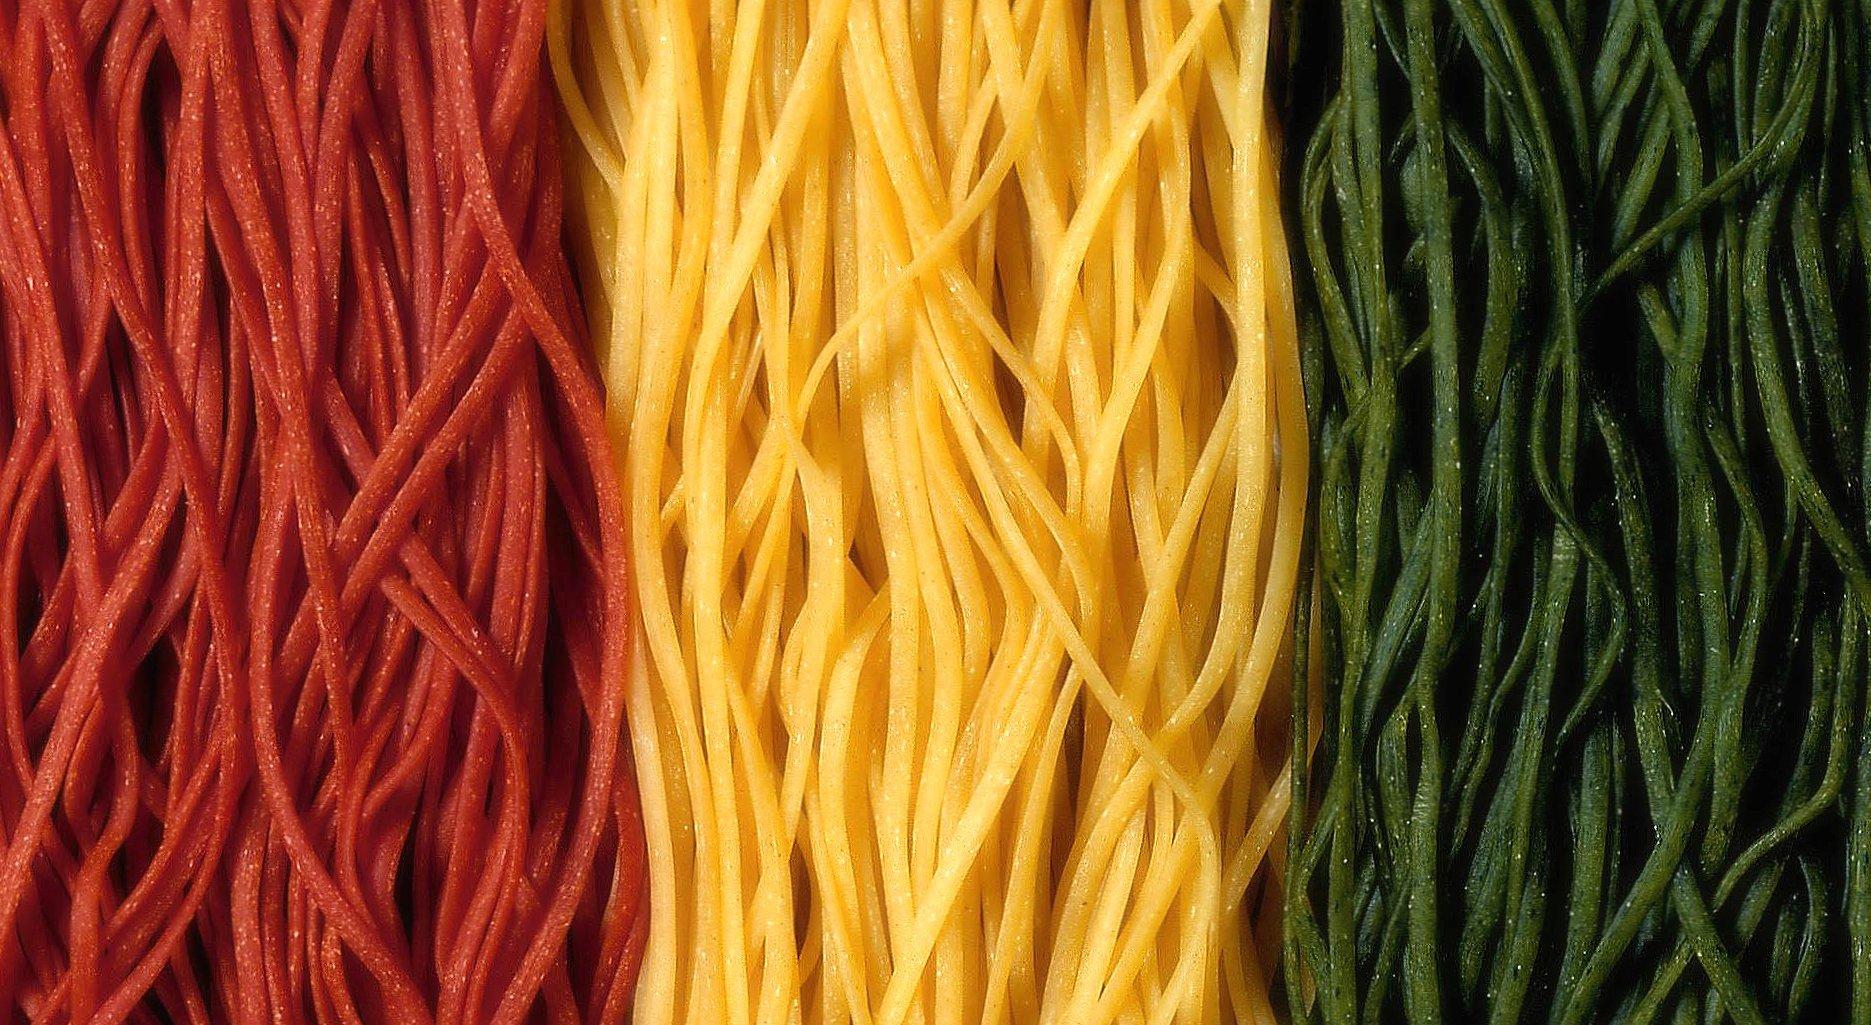 Italian pasta wallpapers HD quality